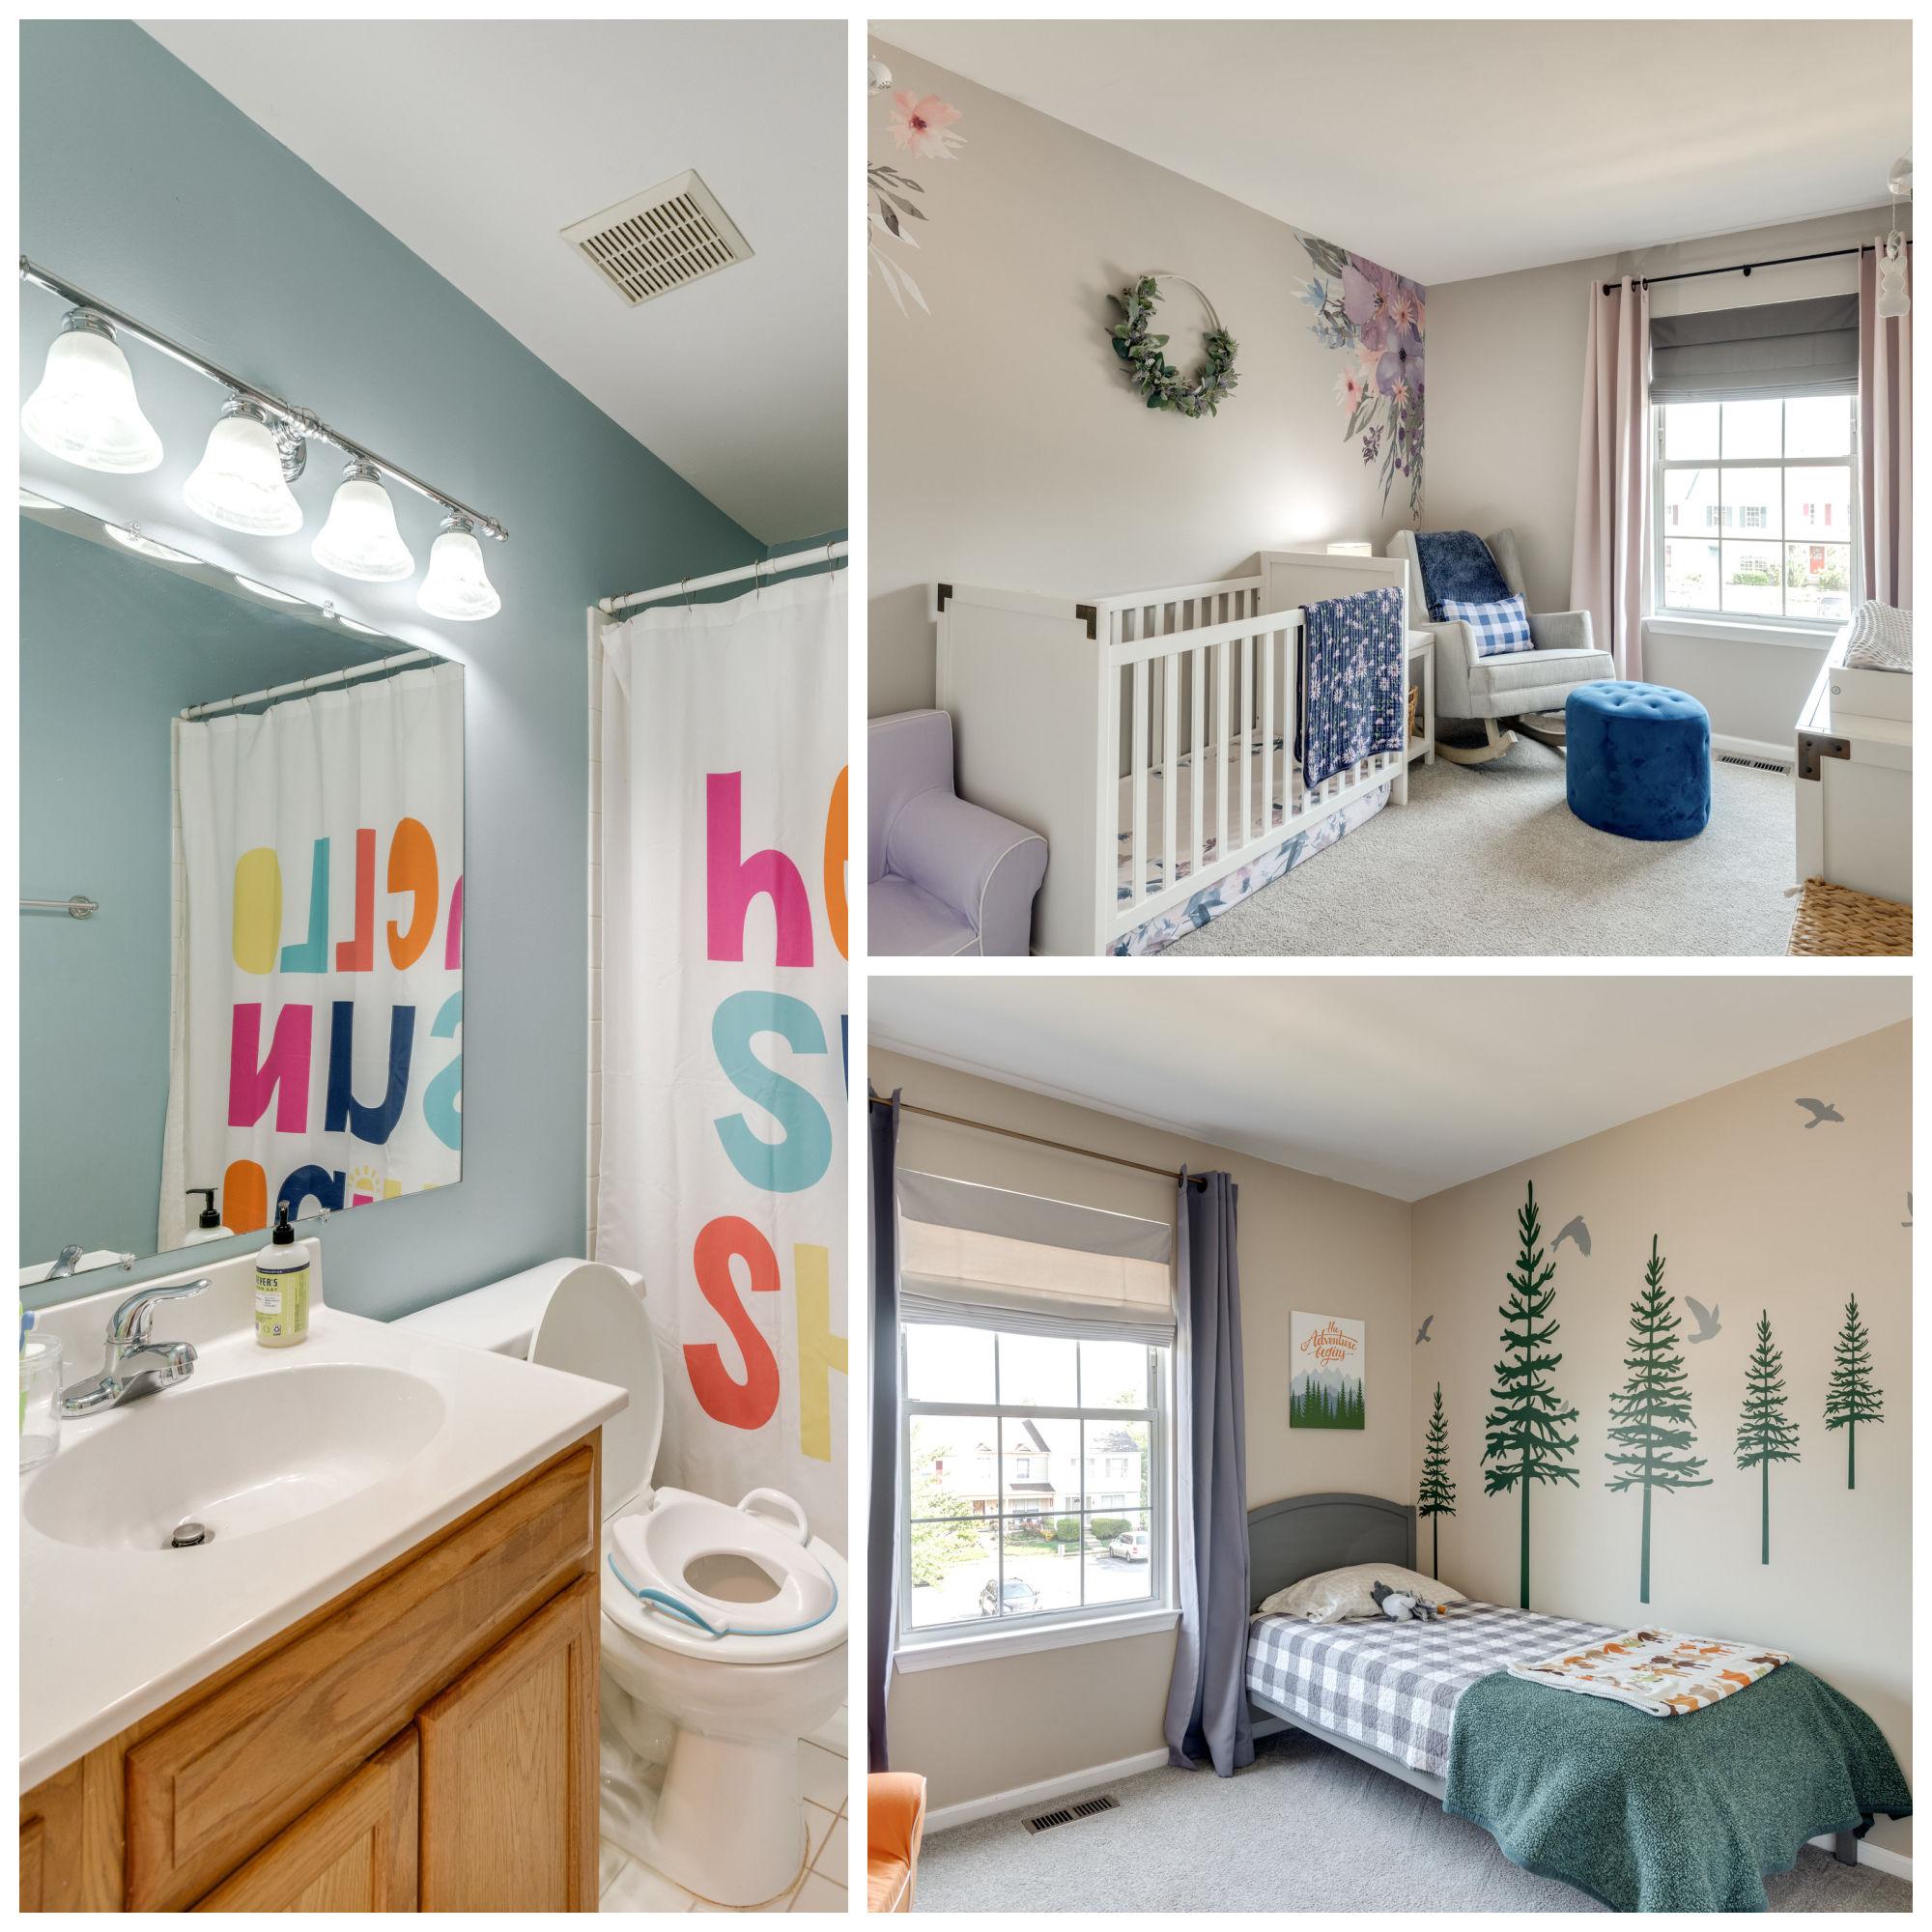 334 Millbrook Ter NE, Leesburg- Additional Bedrooms and Bath